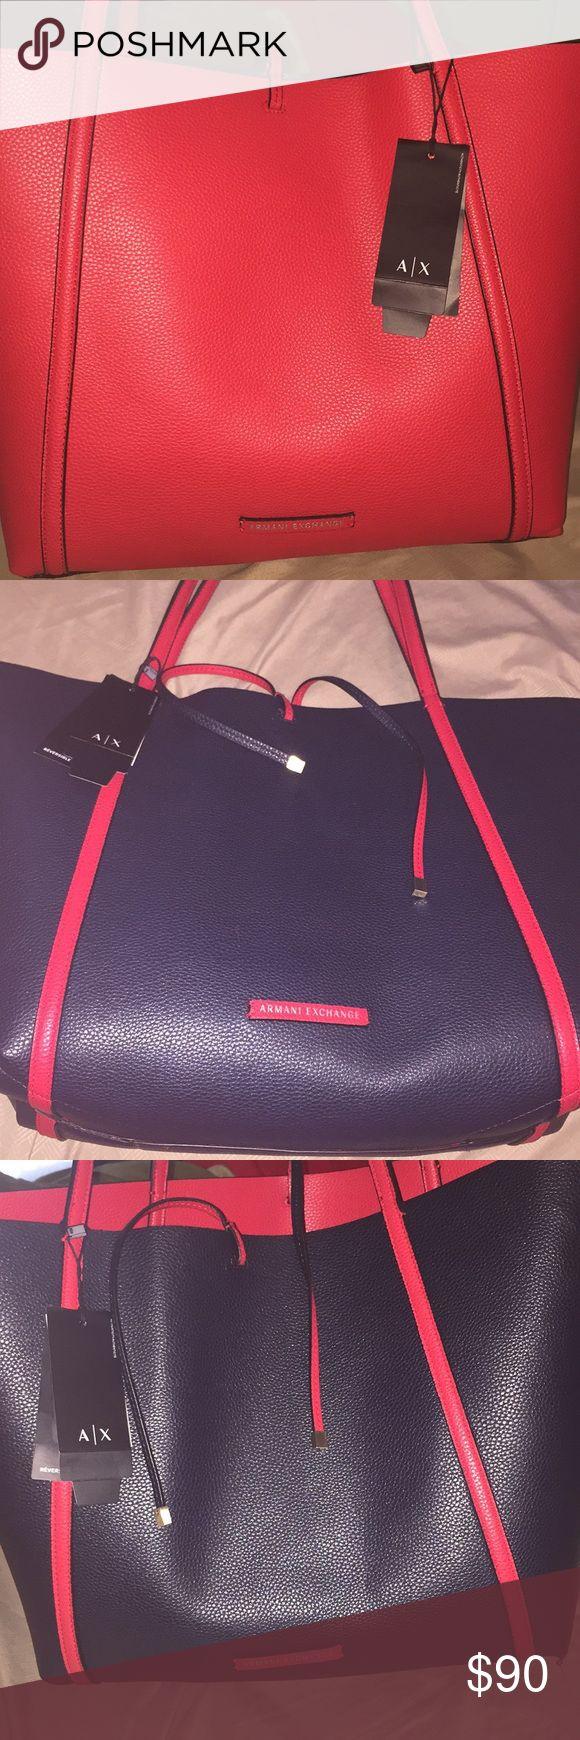 Armani Exchange Purse (Reversible) Reversible Armani Exchange Purse! New, but never used! Great, stylish Purse. Price negotiable Armani Exchange Bags Shoulder Bags